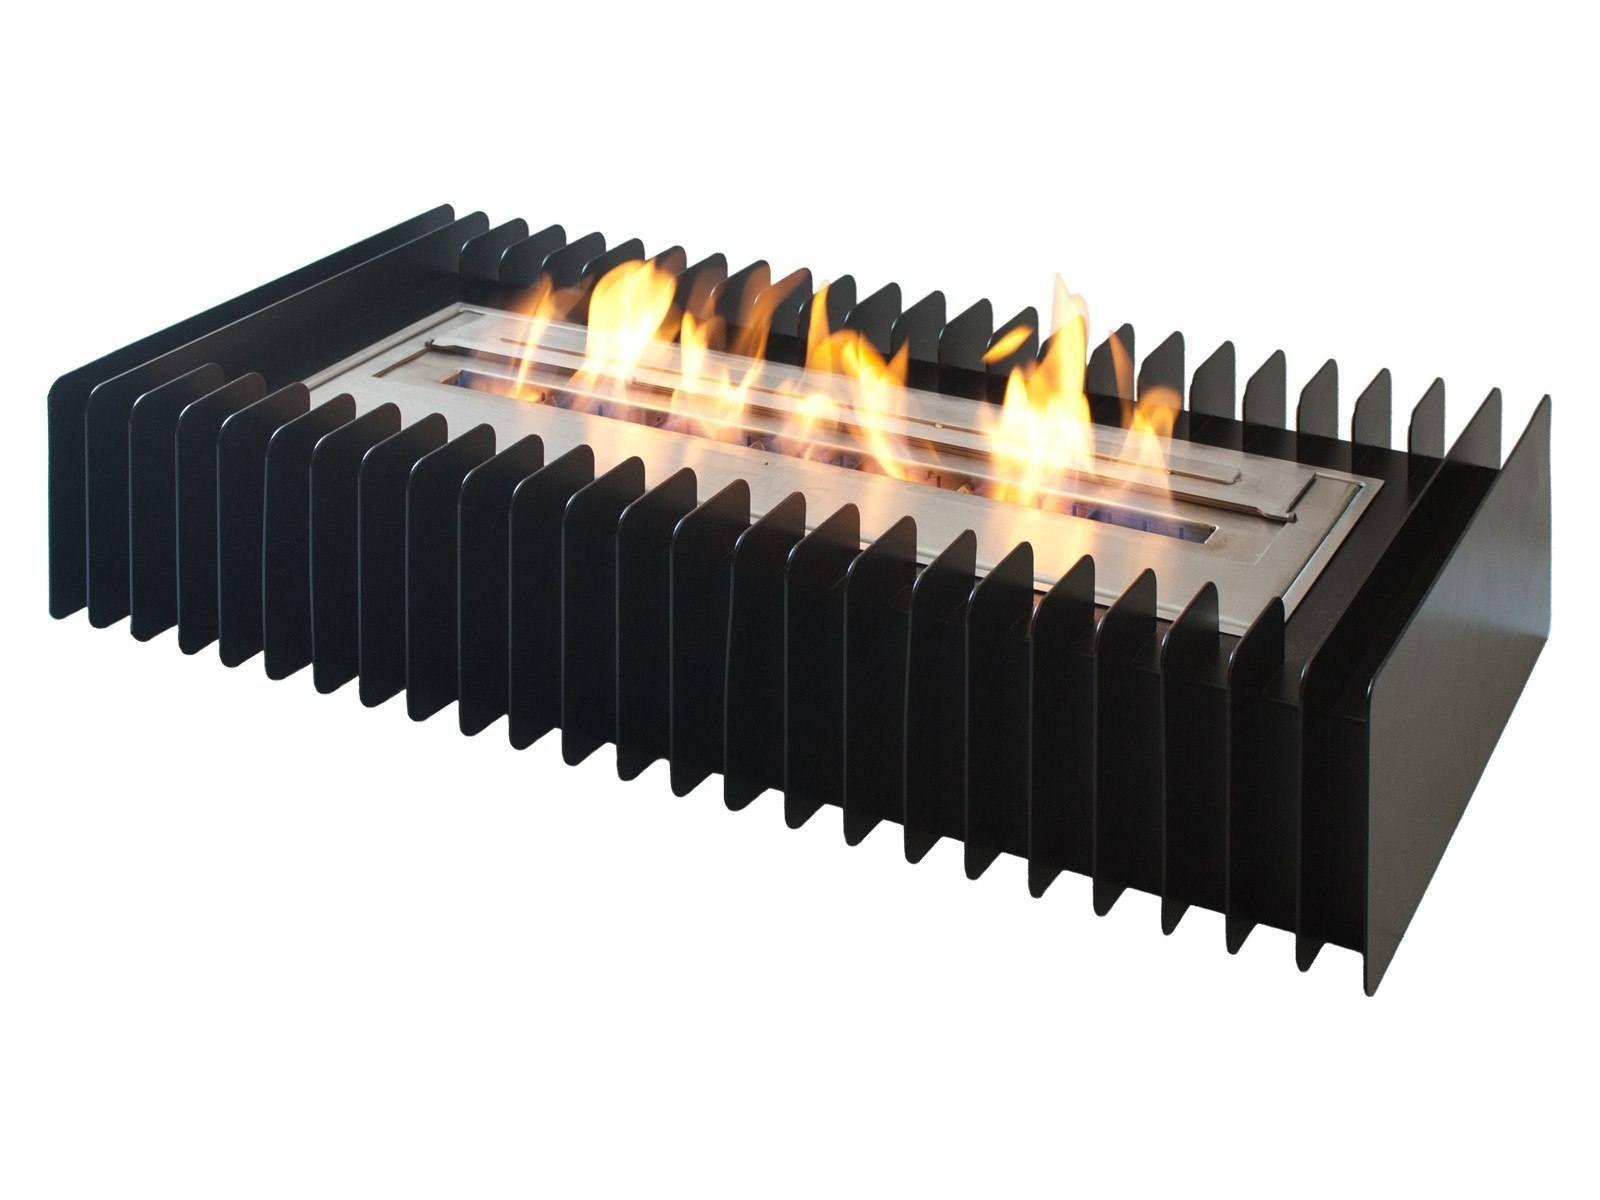 ignis ebg2400 ethanol fireplace grate 30 fireplace grate ethanol